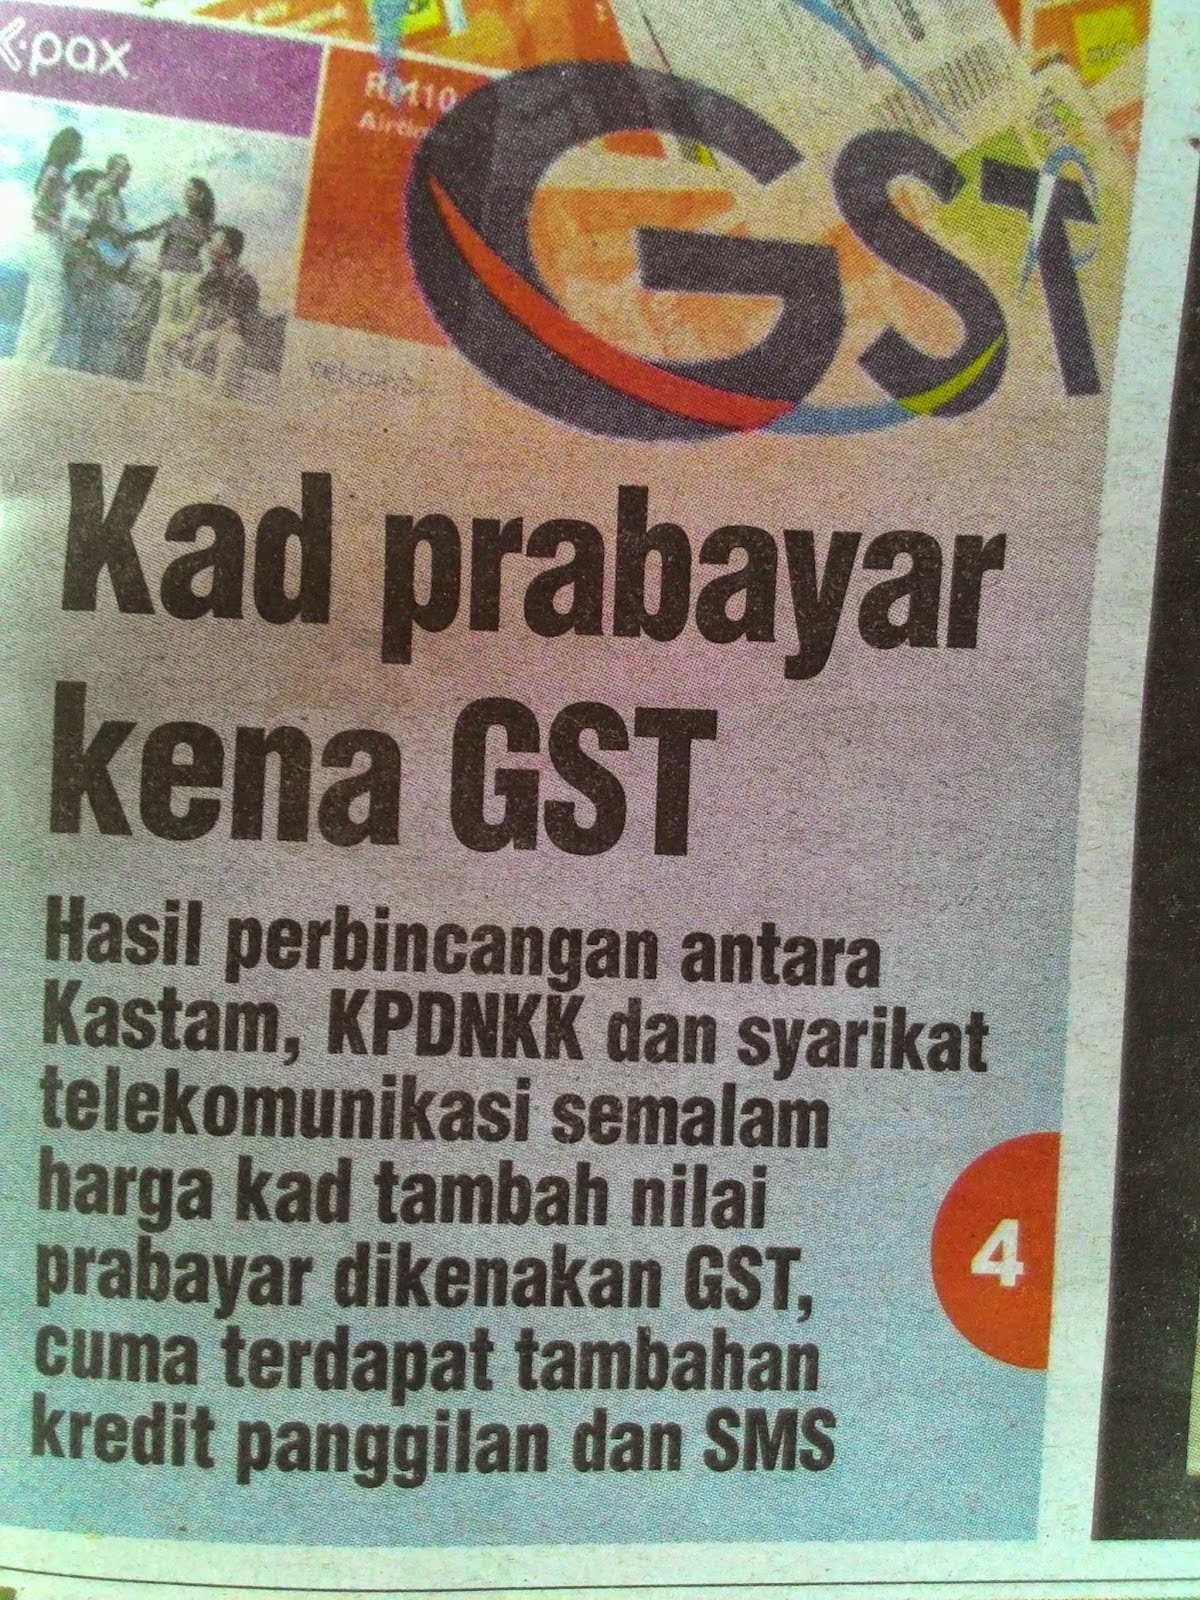 GST Prabayar Pun BN Tak Mampu Selesai Apa Lagi Janji P raya